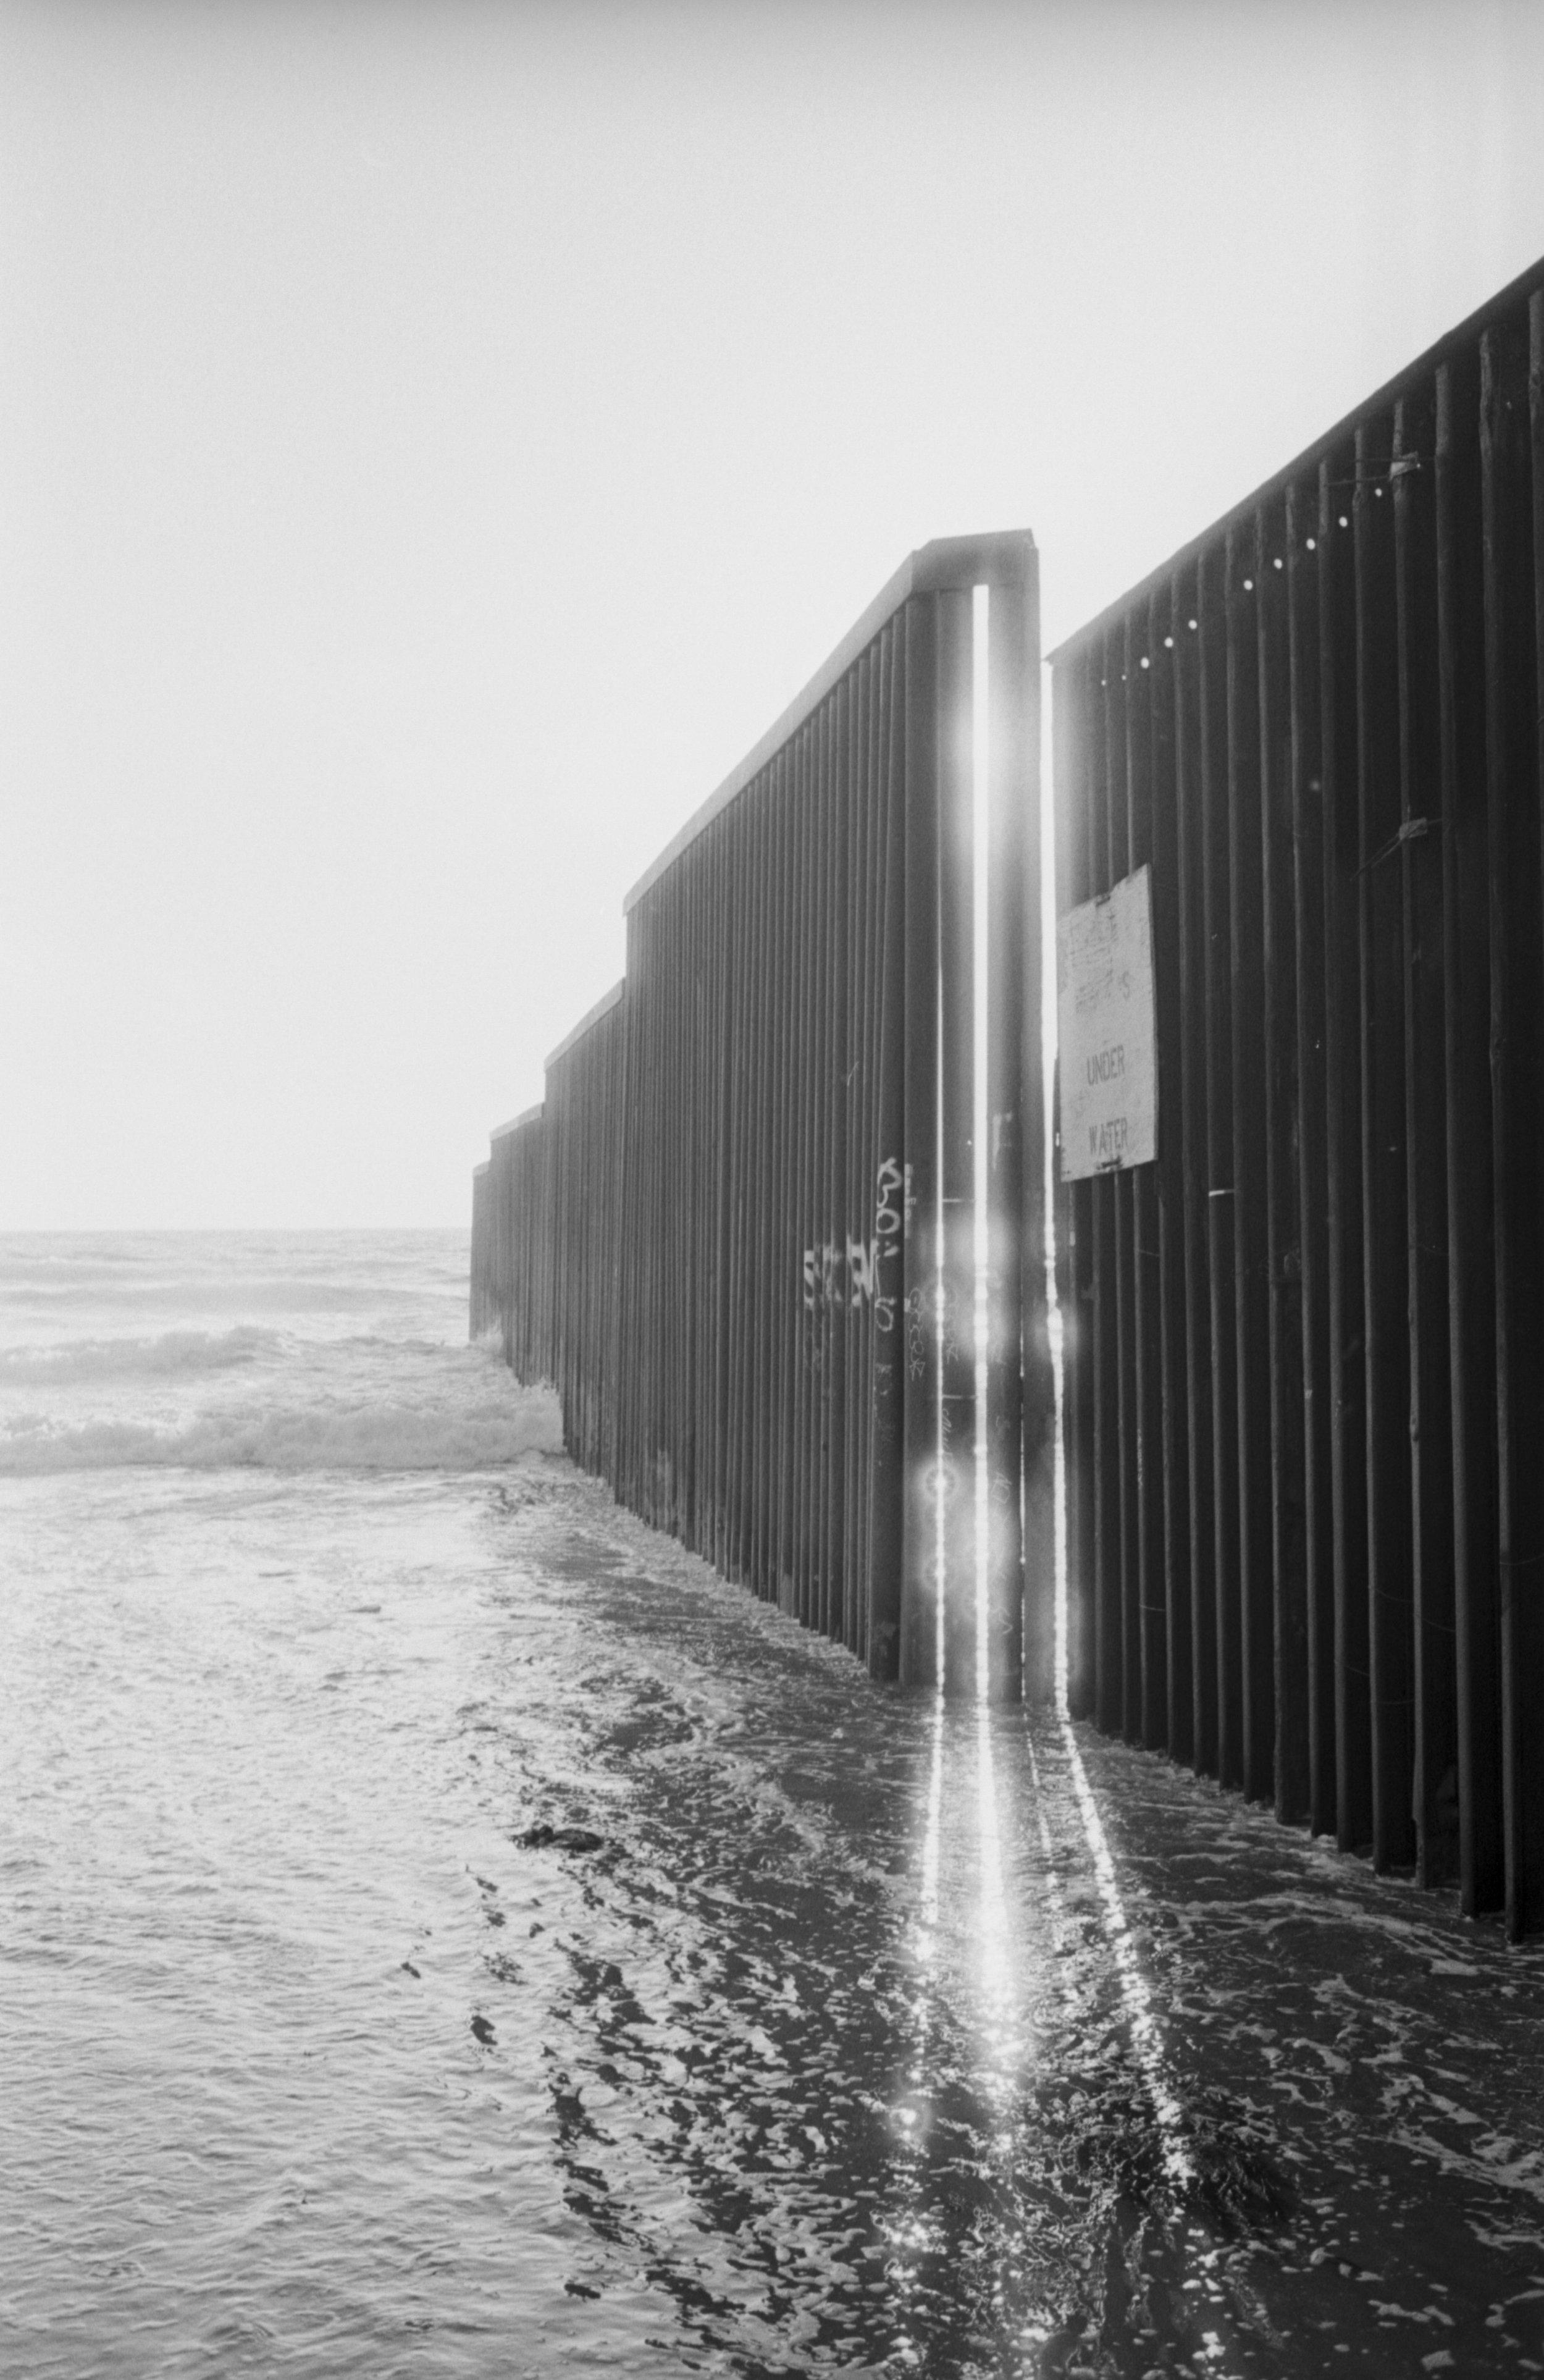 websized Analog Photographer living in Playa del Carmen Tulum Traveling the World003.jpg